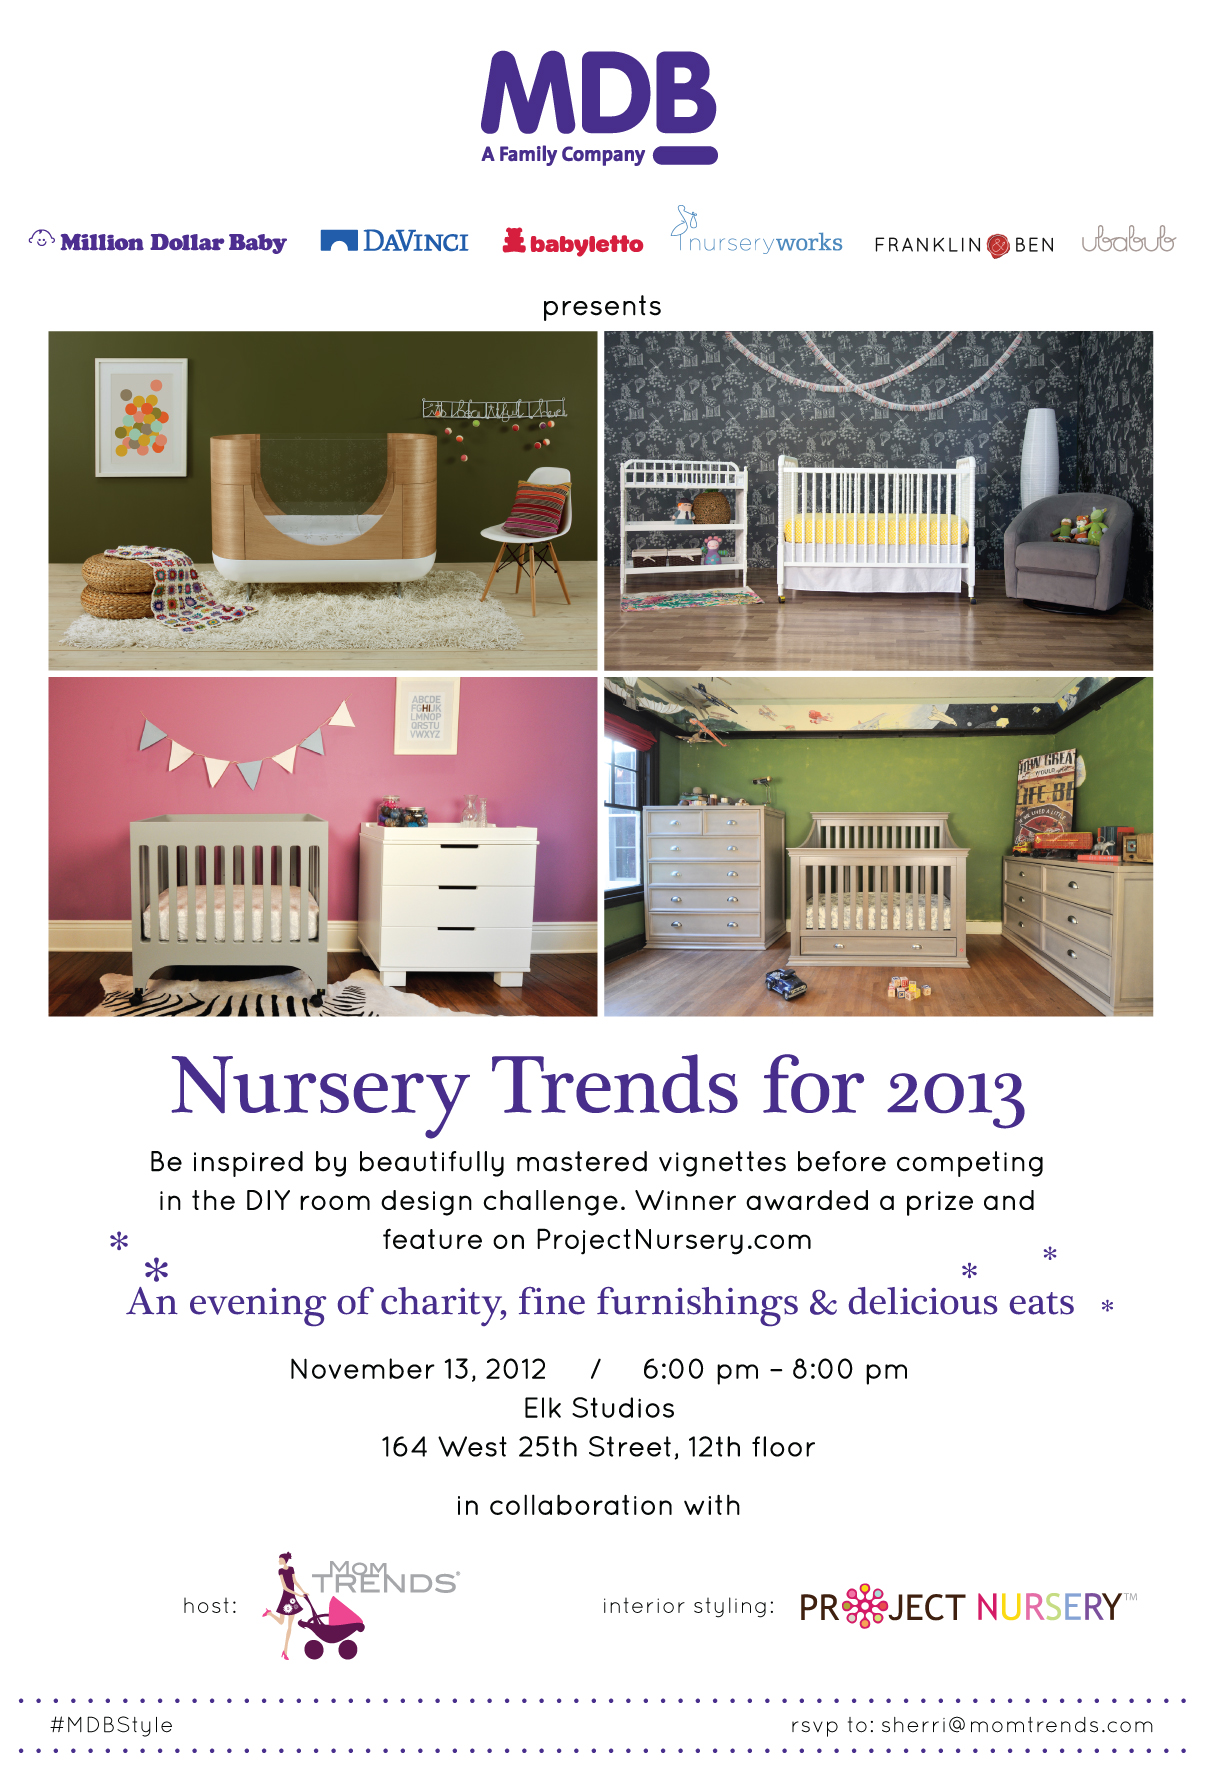 13 new nursery trends - photo #34